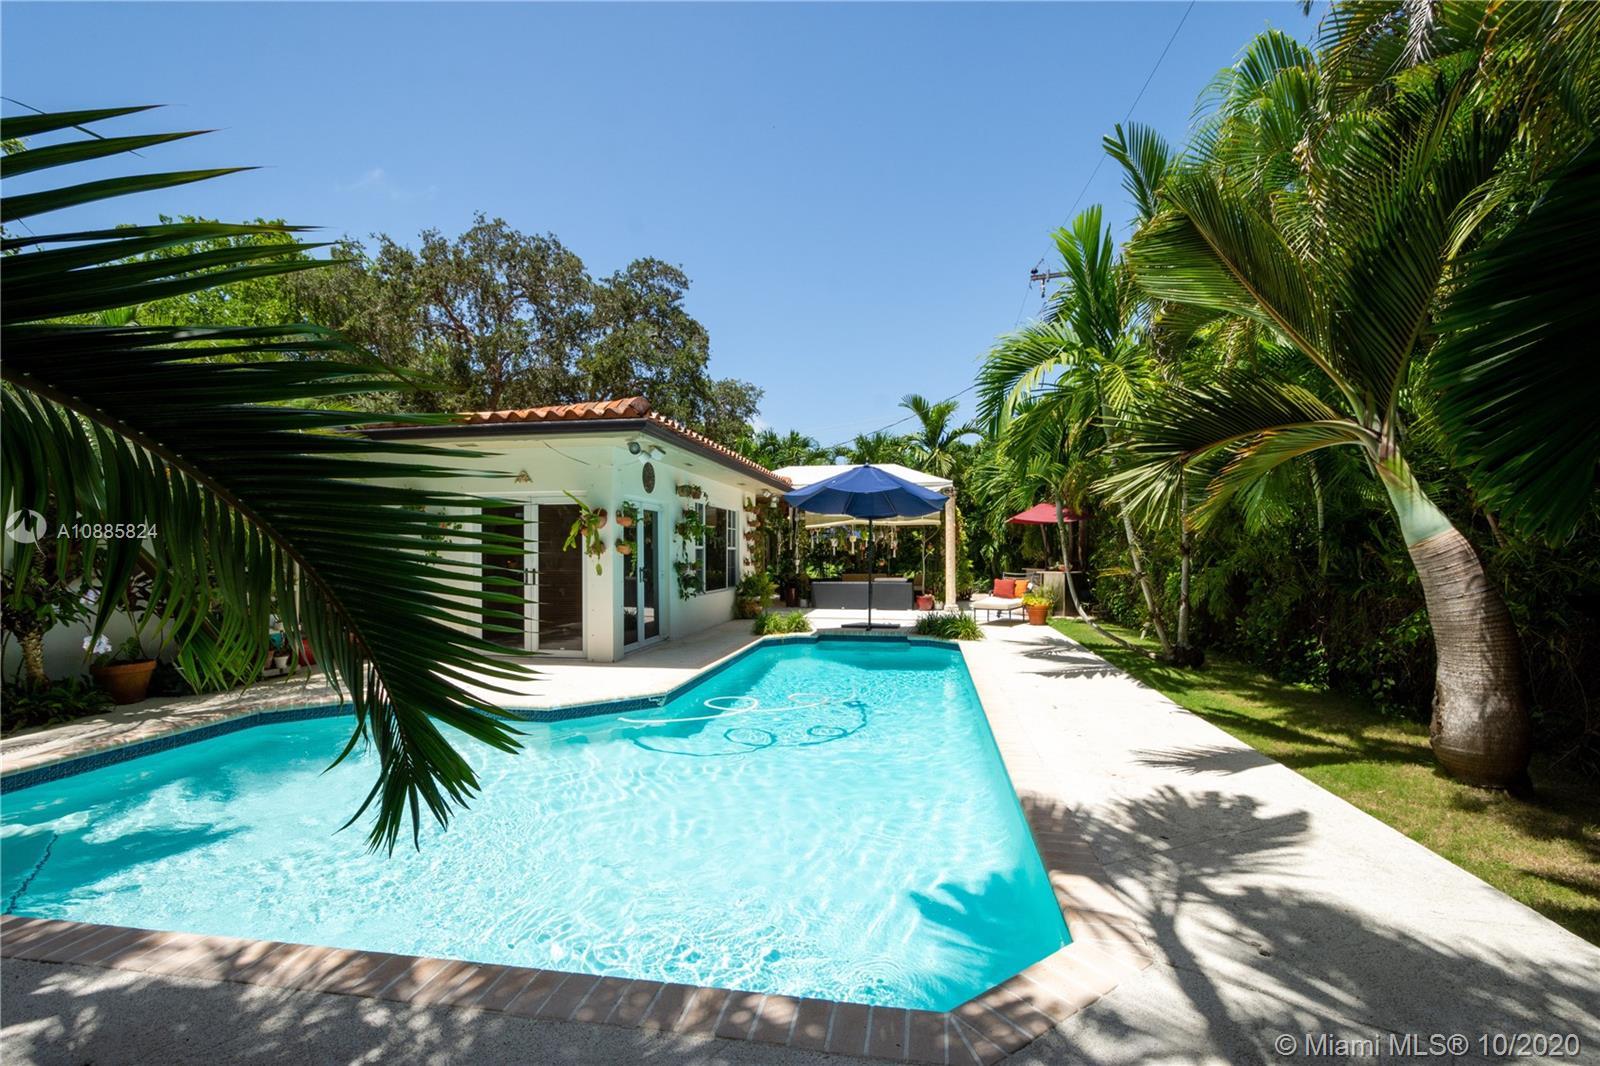 South Miami - 1025 S Bayamo Ave, Coral Gables, FL 33146